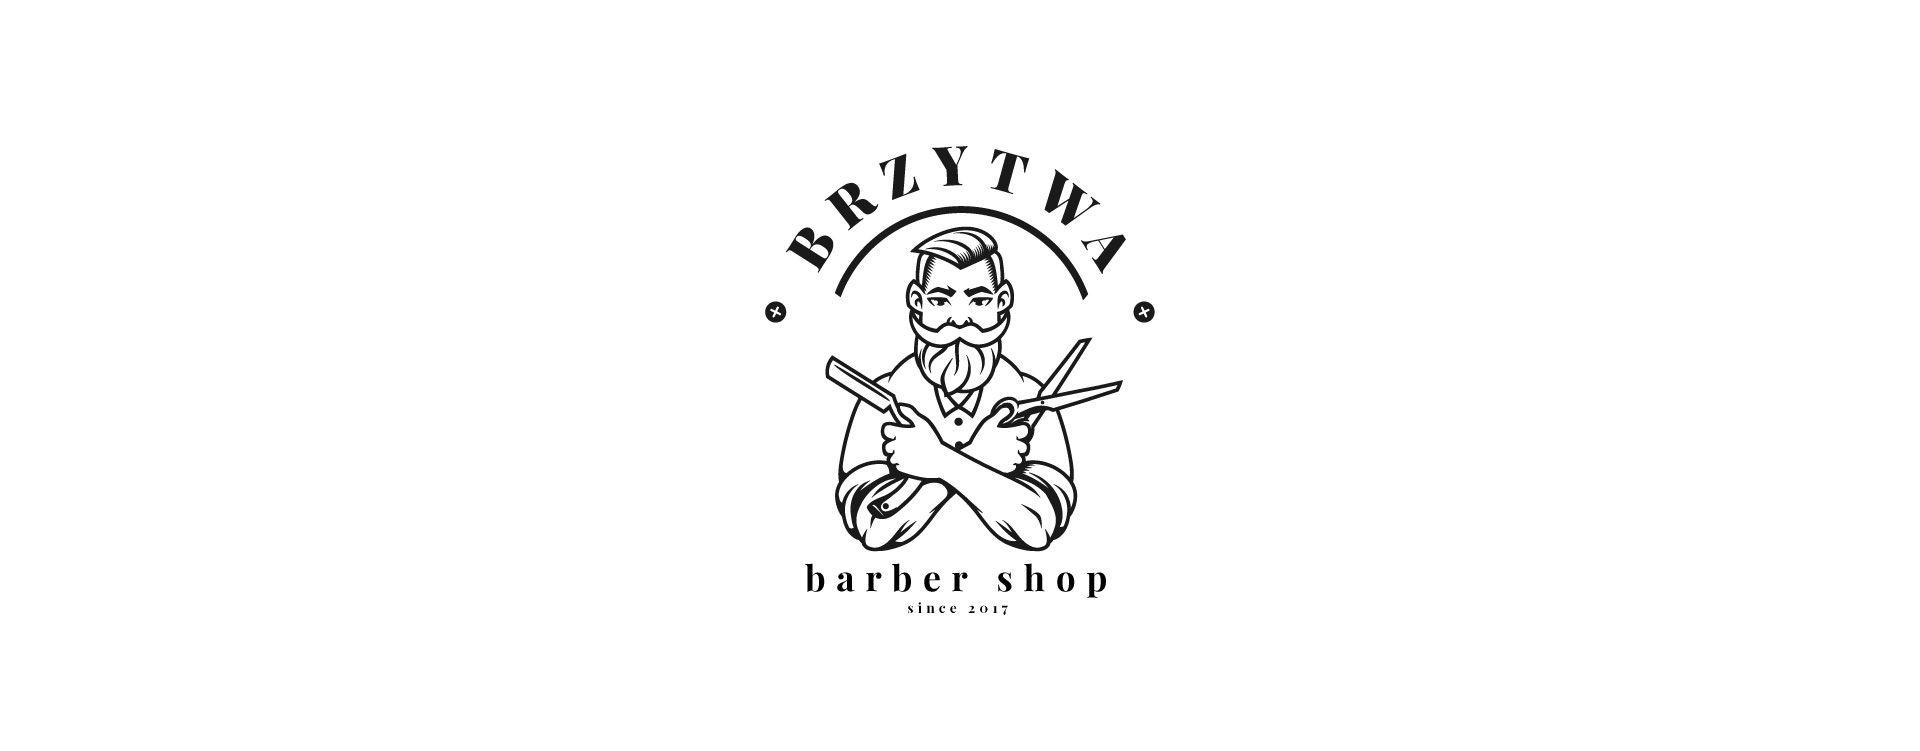 Brzytwa - barber shop barber logo2 1